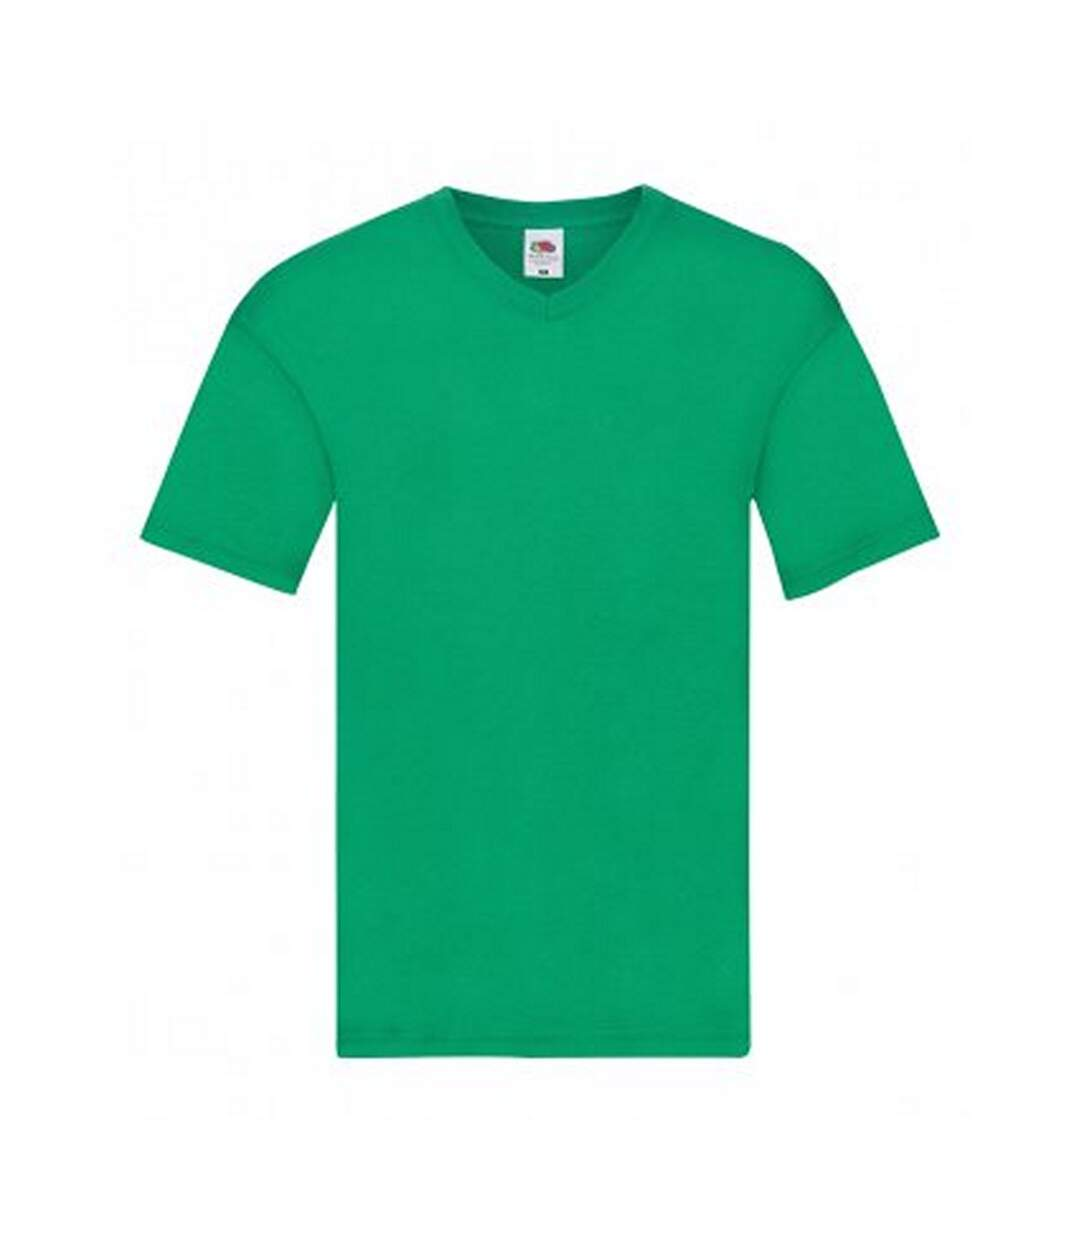 Fruit Of The Loom Mens Original V Neck T-Shirt (Kelly) - UTPC3034